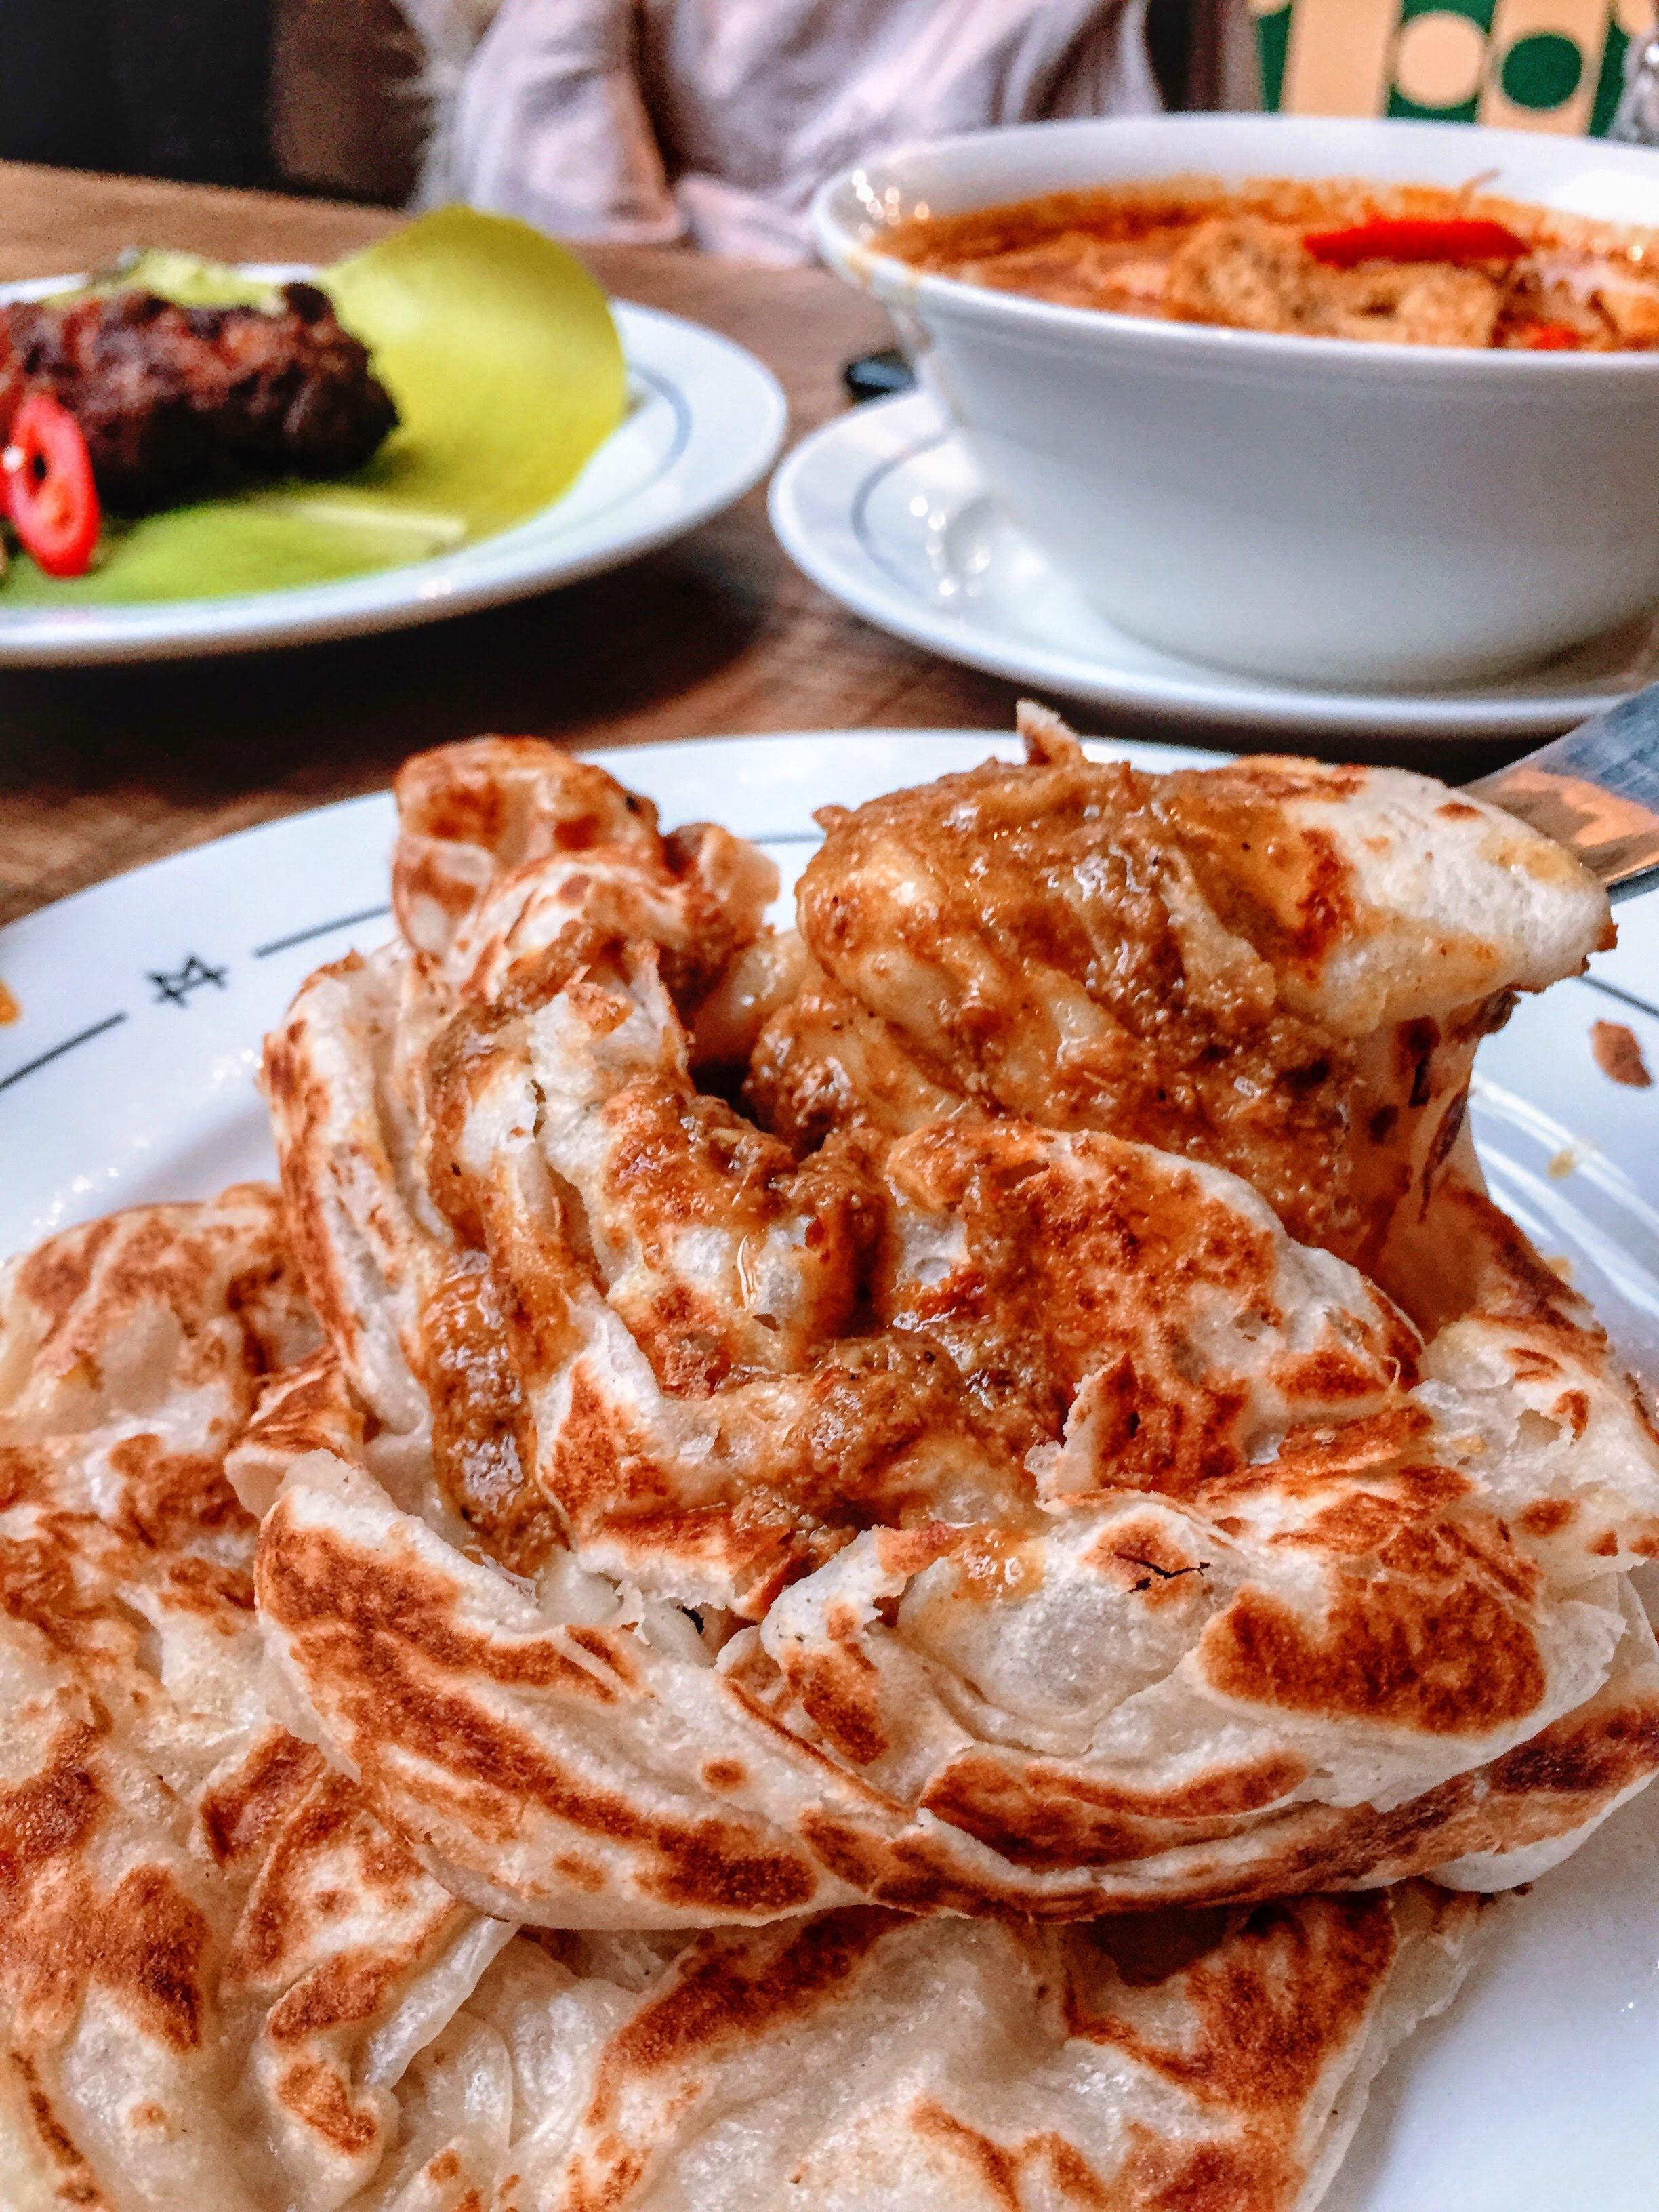 Roti Canai Beef Rendang